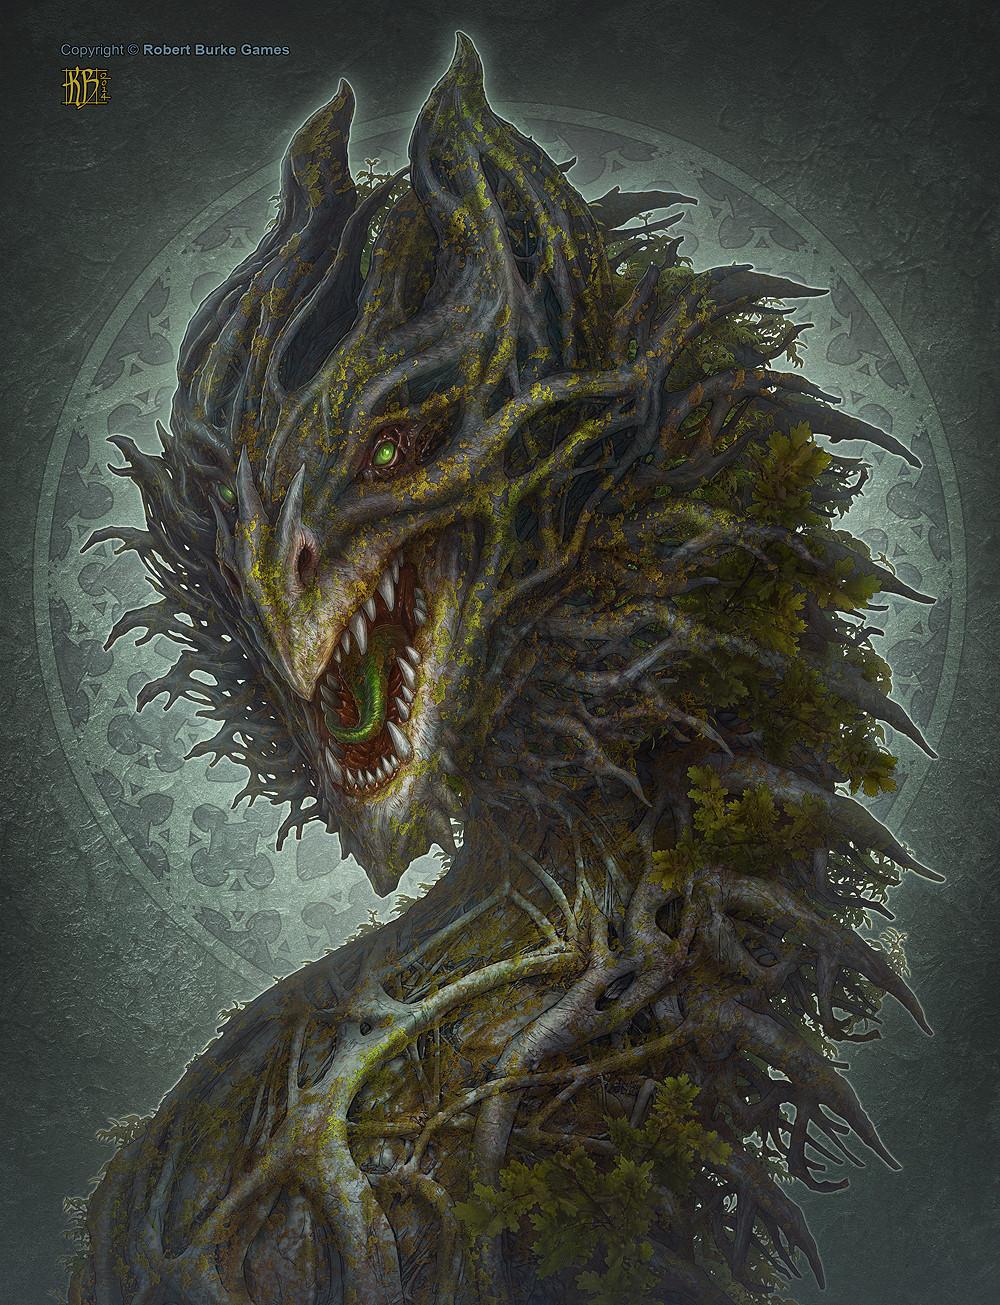 Artstation - Forest Dragon Kerem Beyit